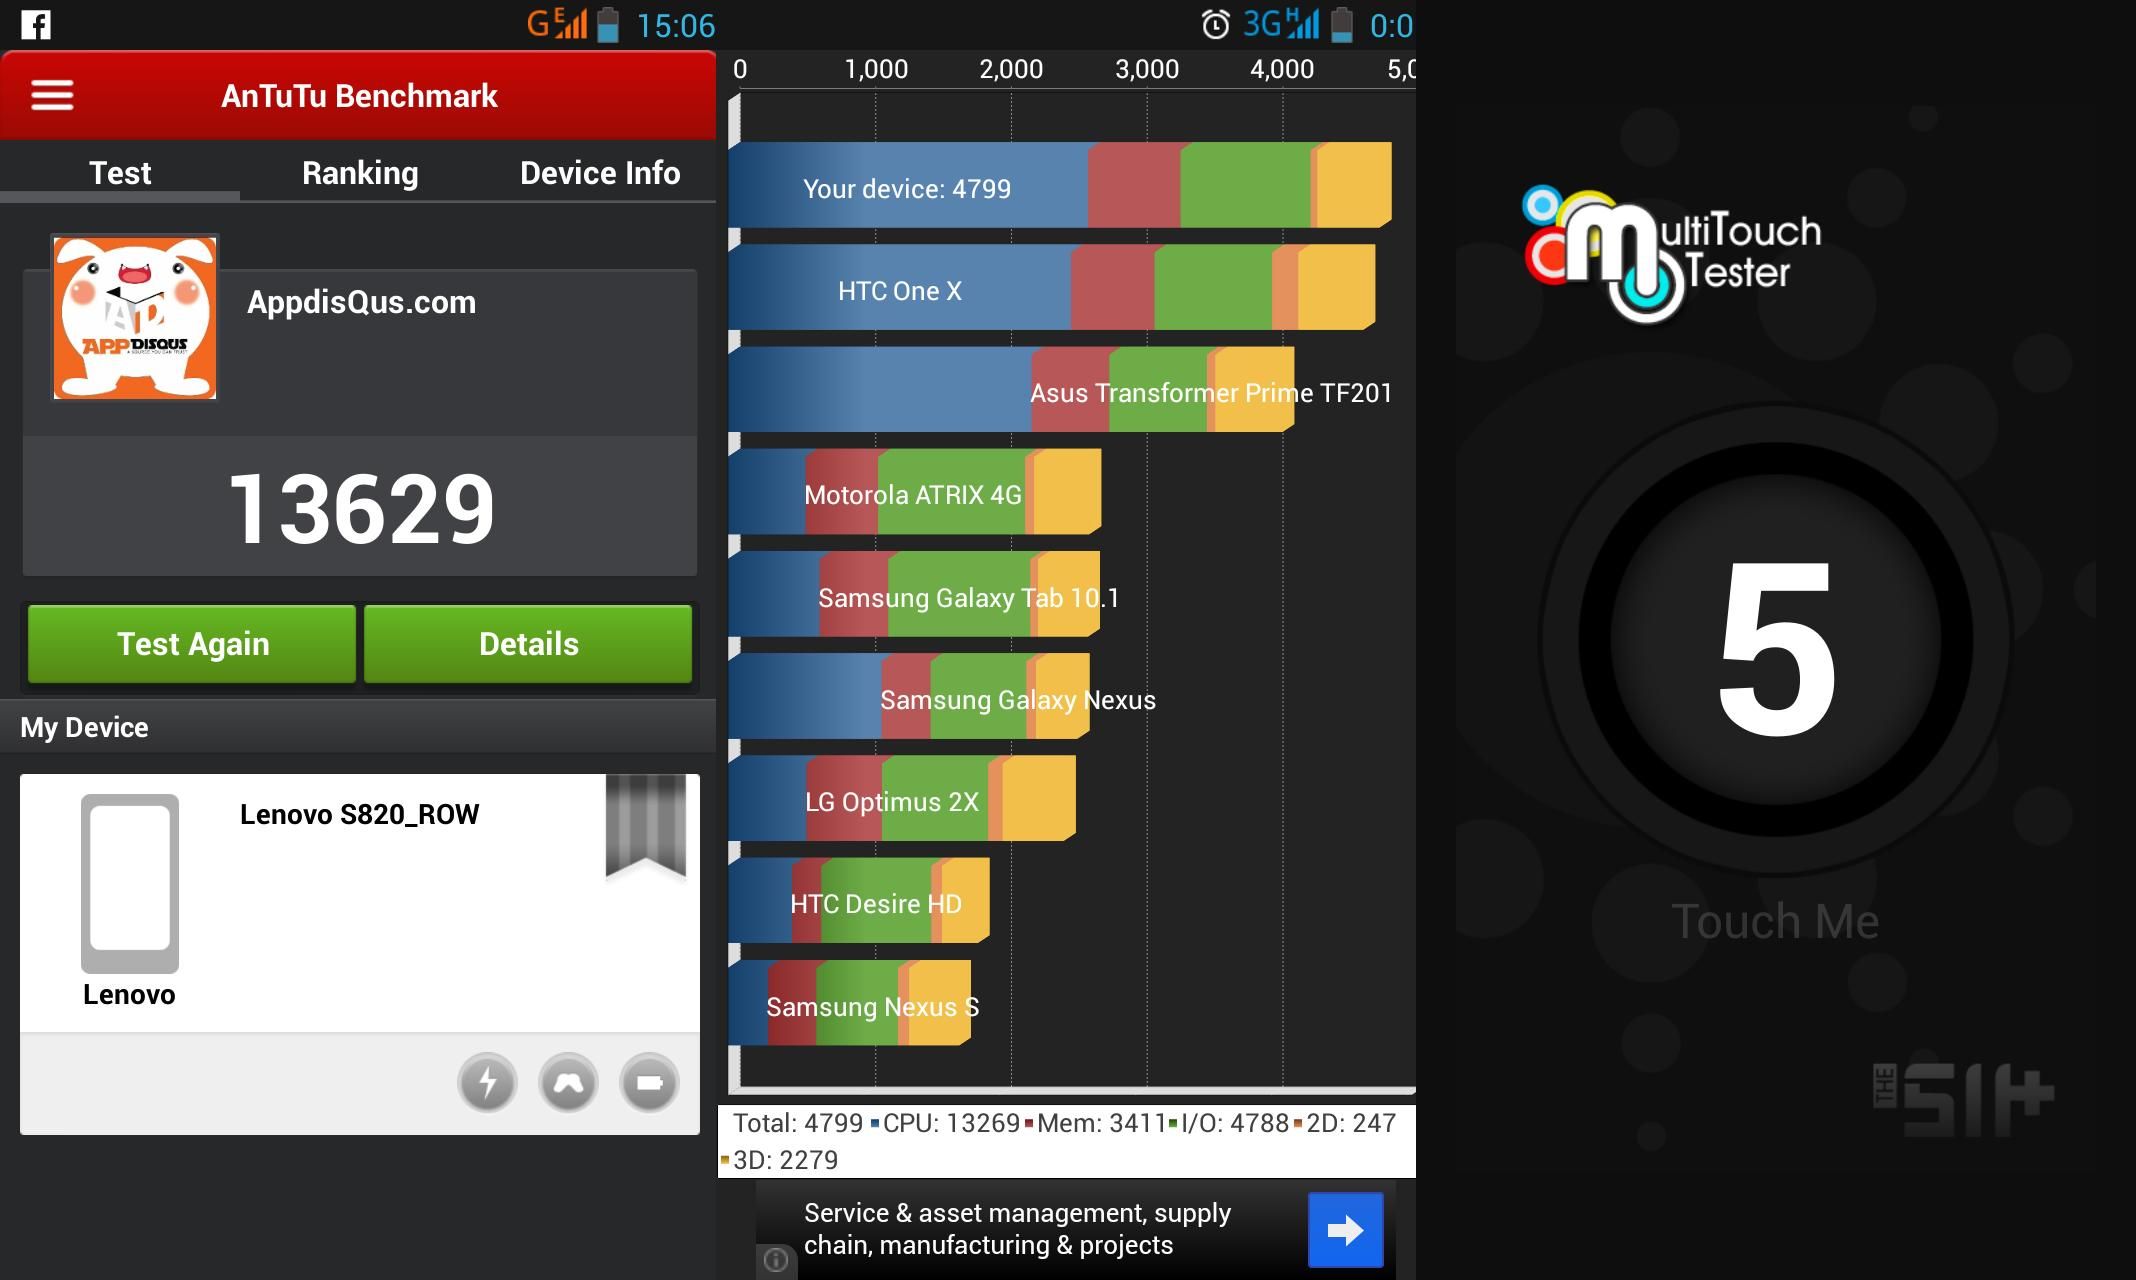 Lenovo s820 screenshot 02